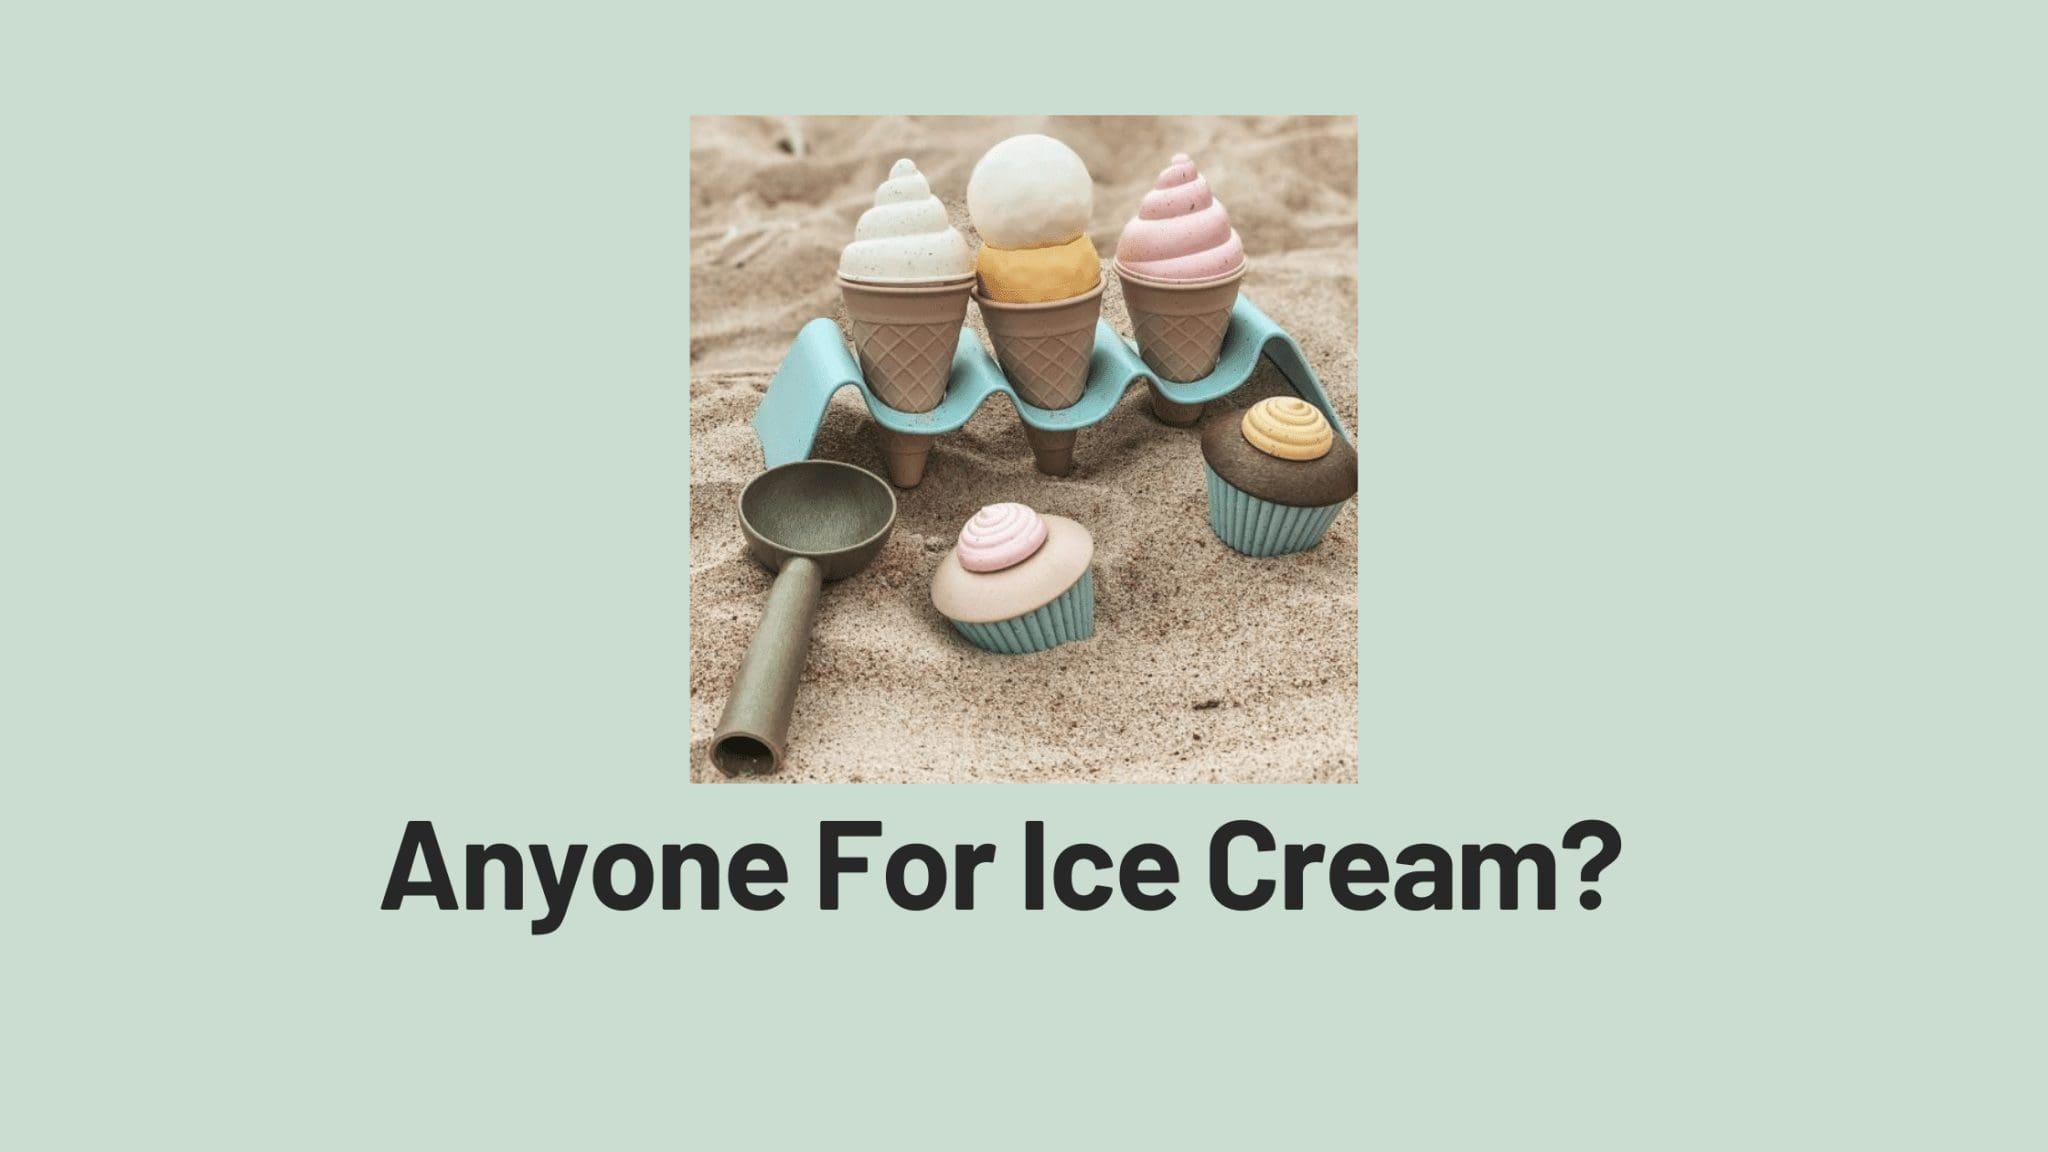 Anyone For Ice Cream?